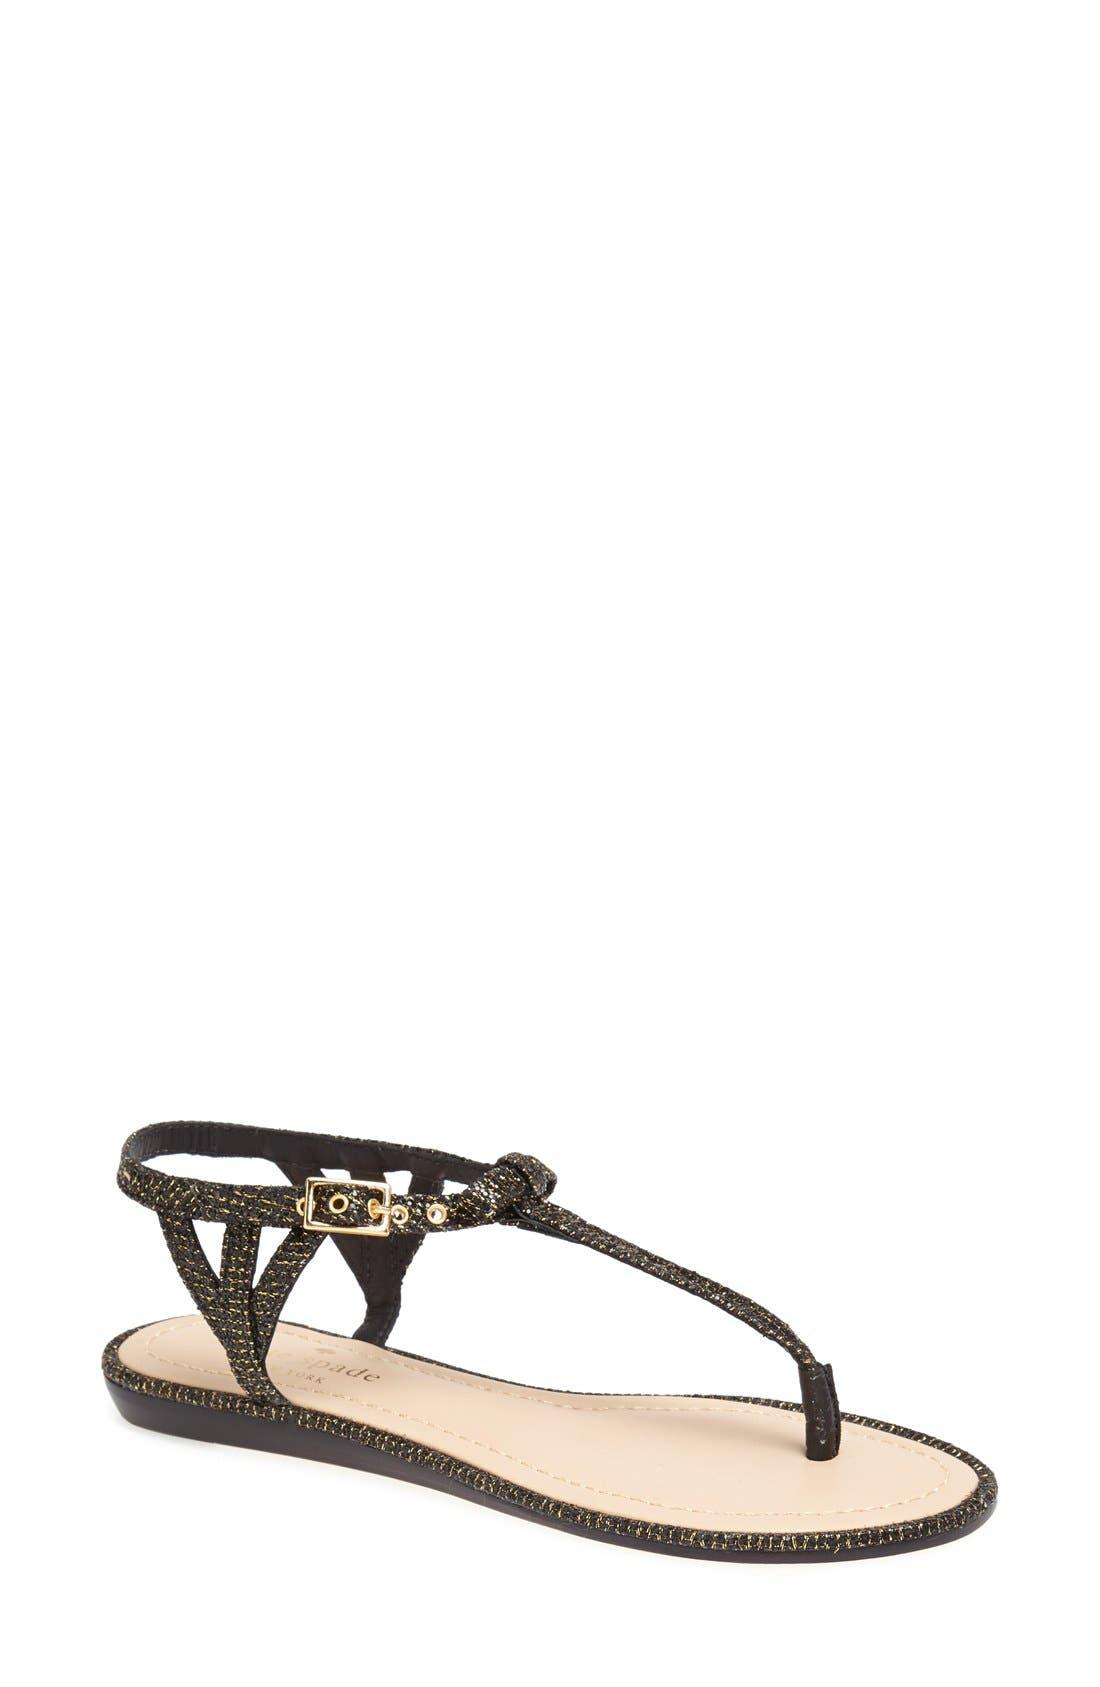 Main Image - kate spade new york 'andrea' flat thong sandal